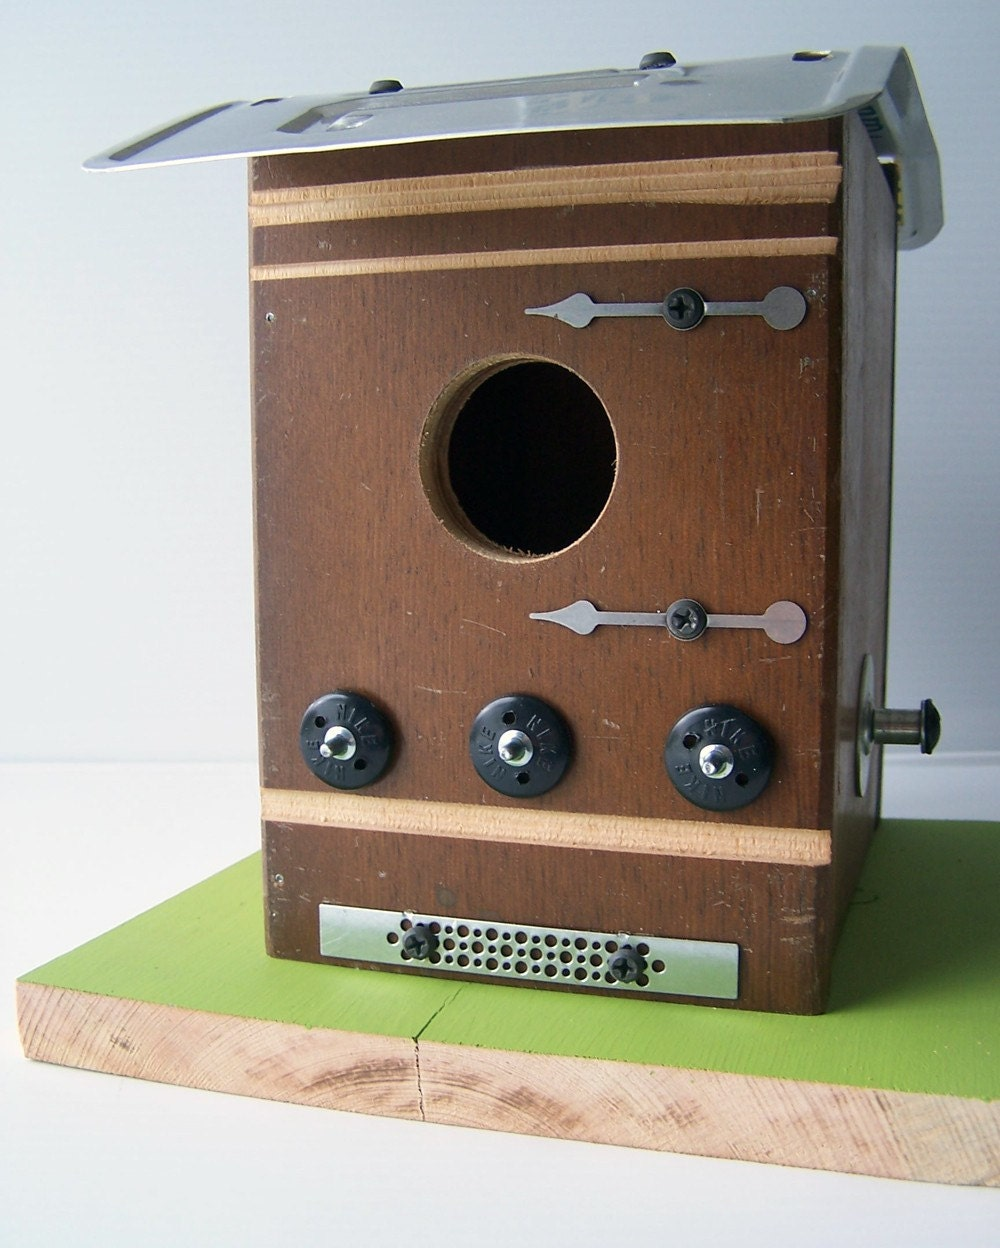 Steampunk Industrial Upcycled Handmade Birdhouse by Garageinc